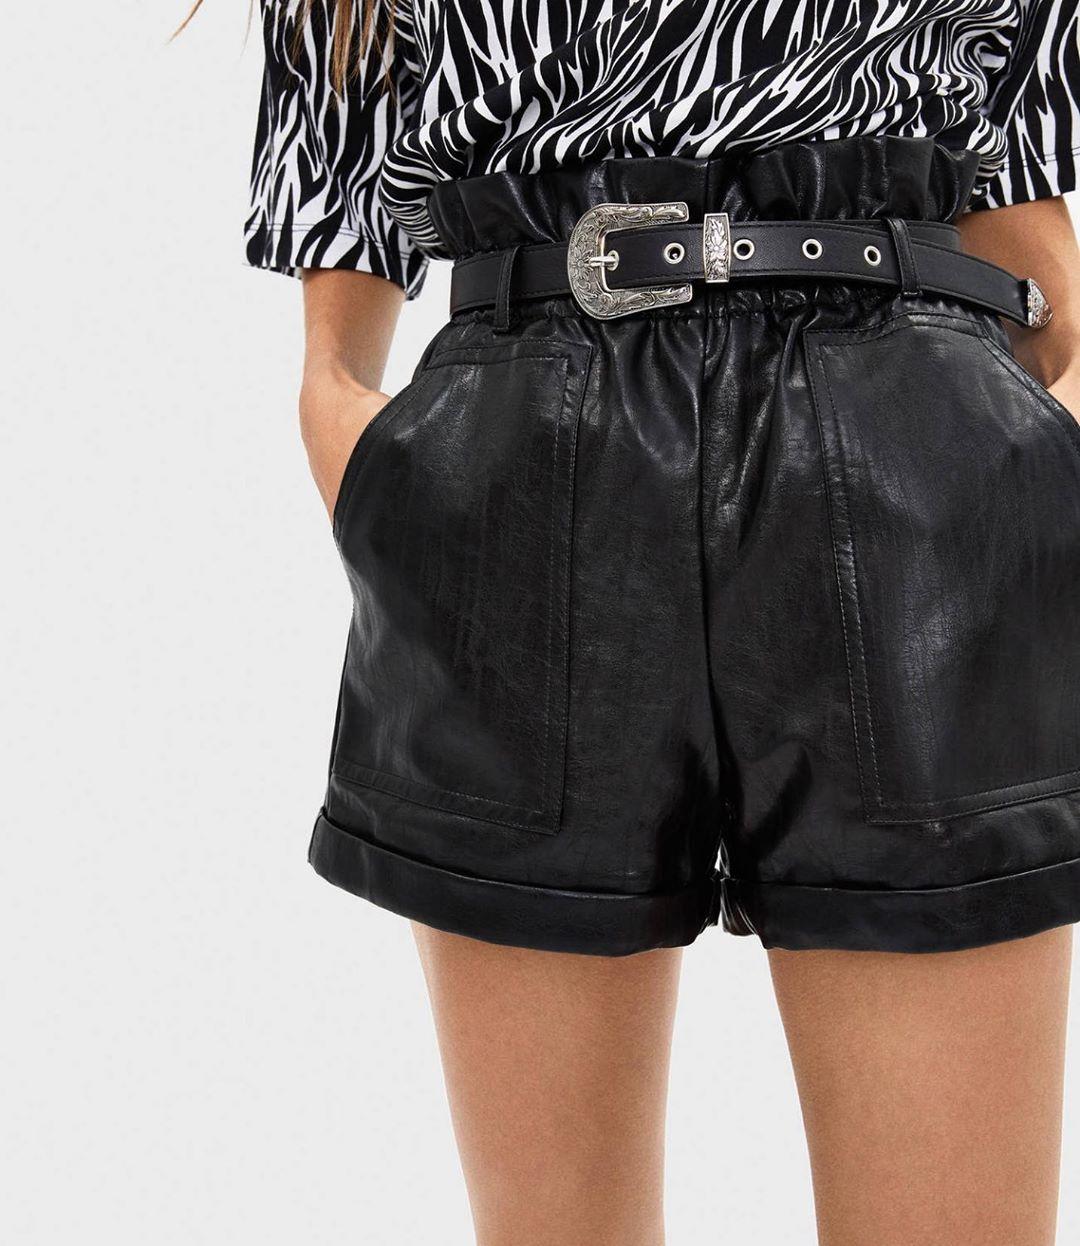 leather effect shorts with belt de Bershka sur outfitspertutte